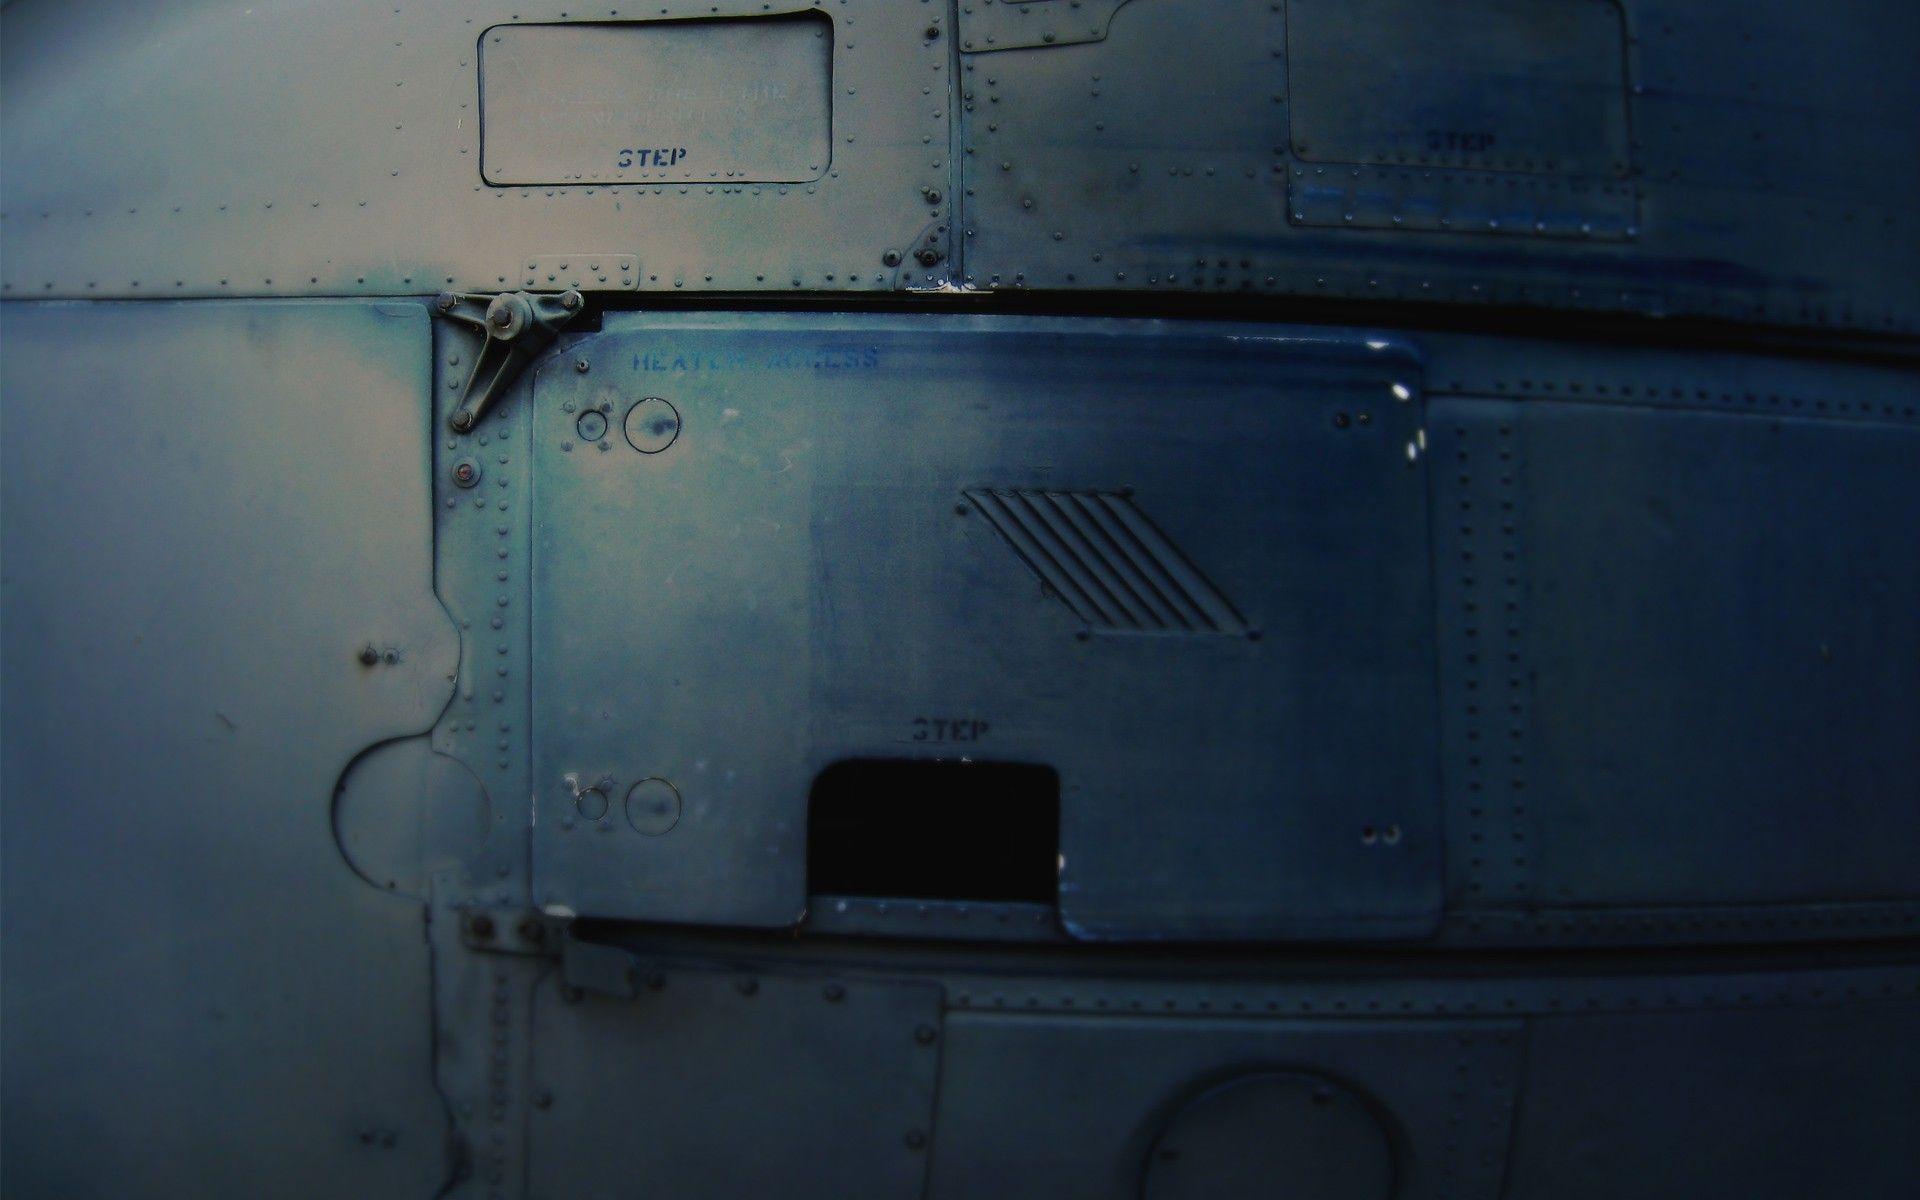 http://hdscreen.me/walls/military/metal-military-textures-3002463-1920x1200.jpg